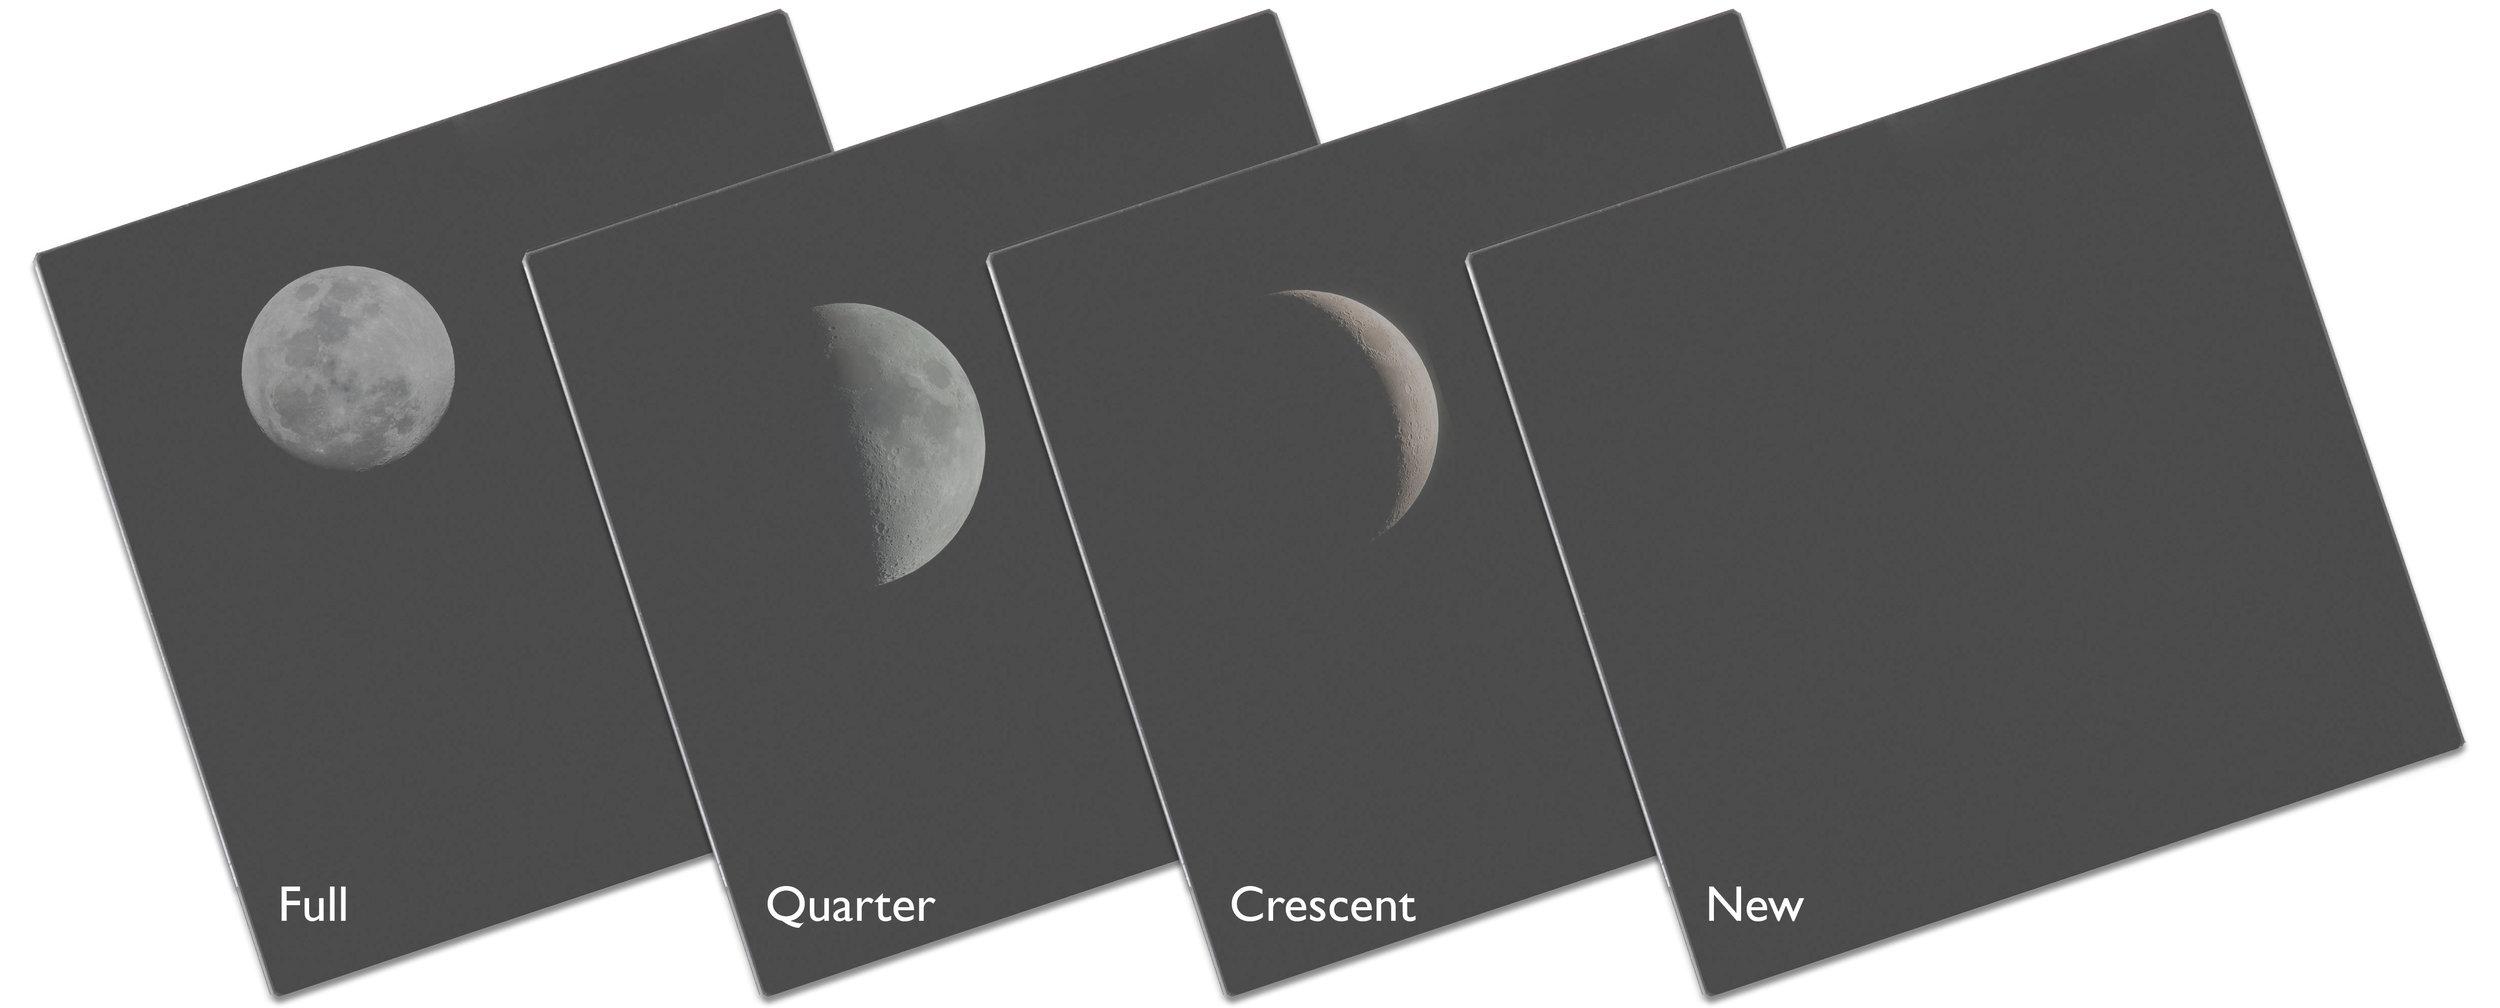 moon filter phases.jpg